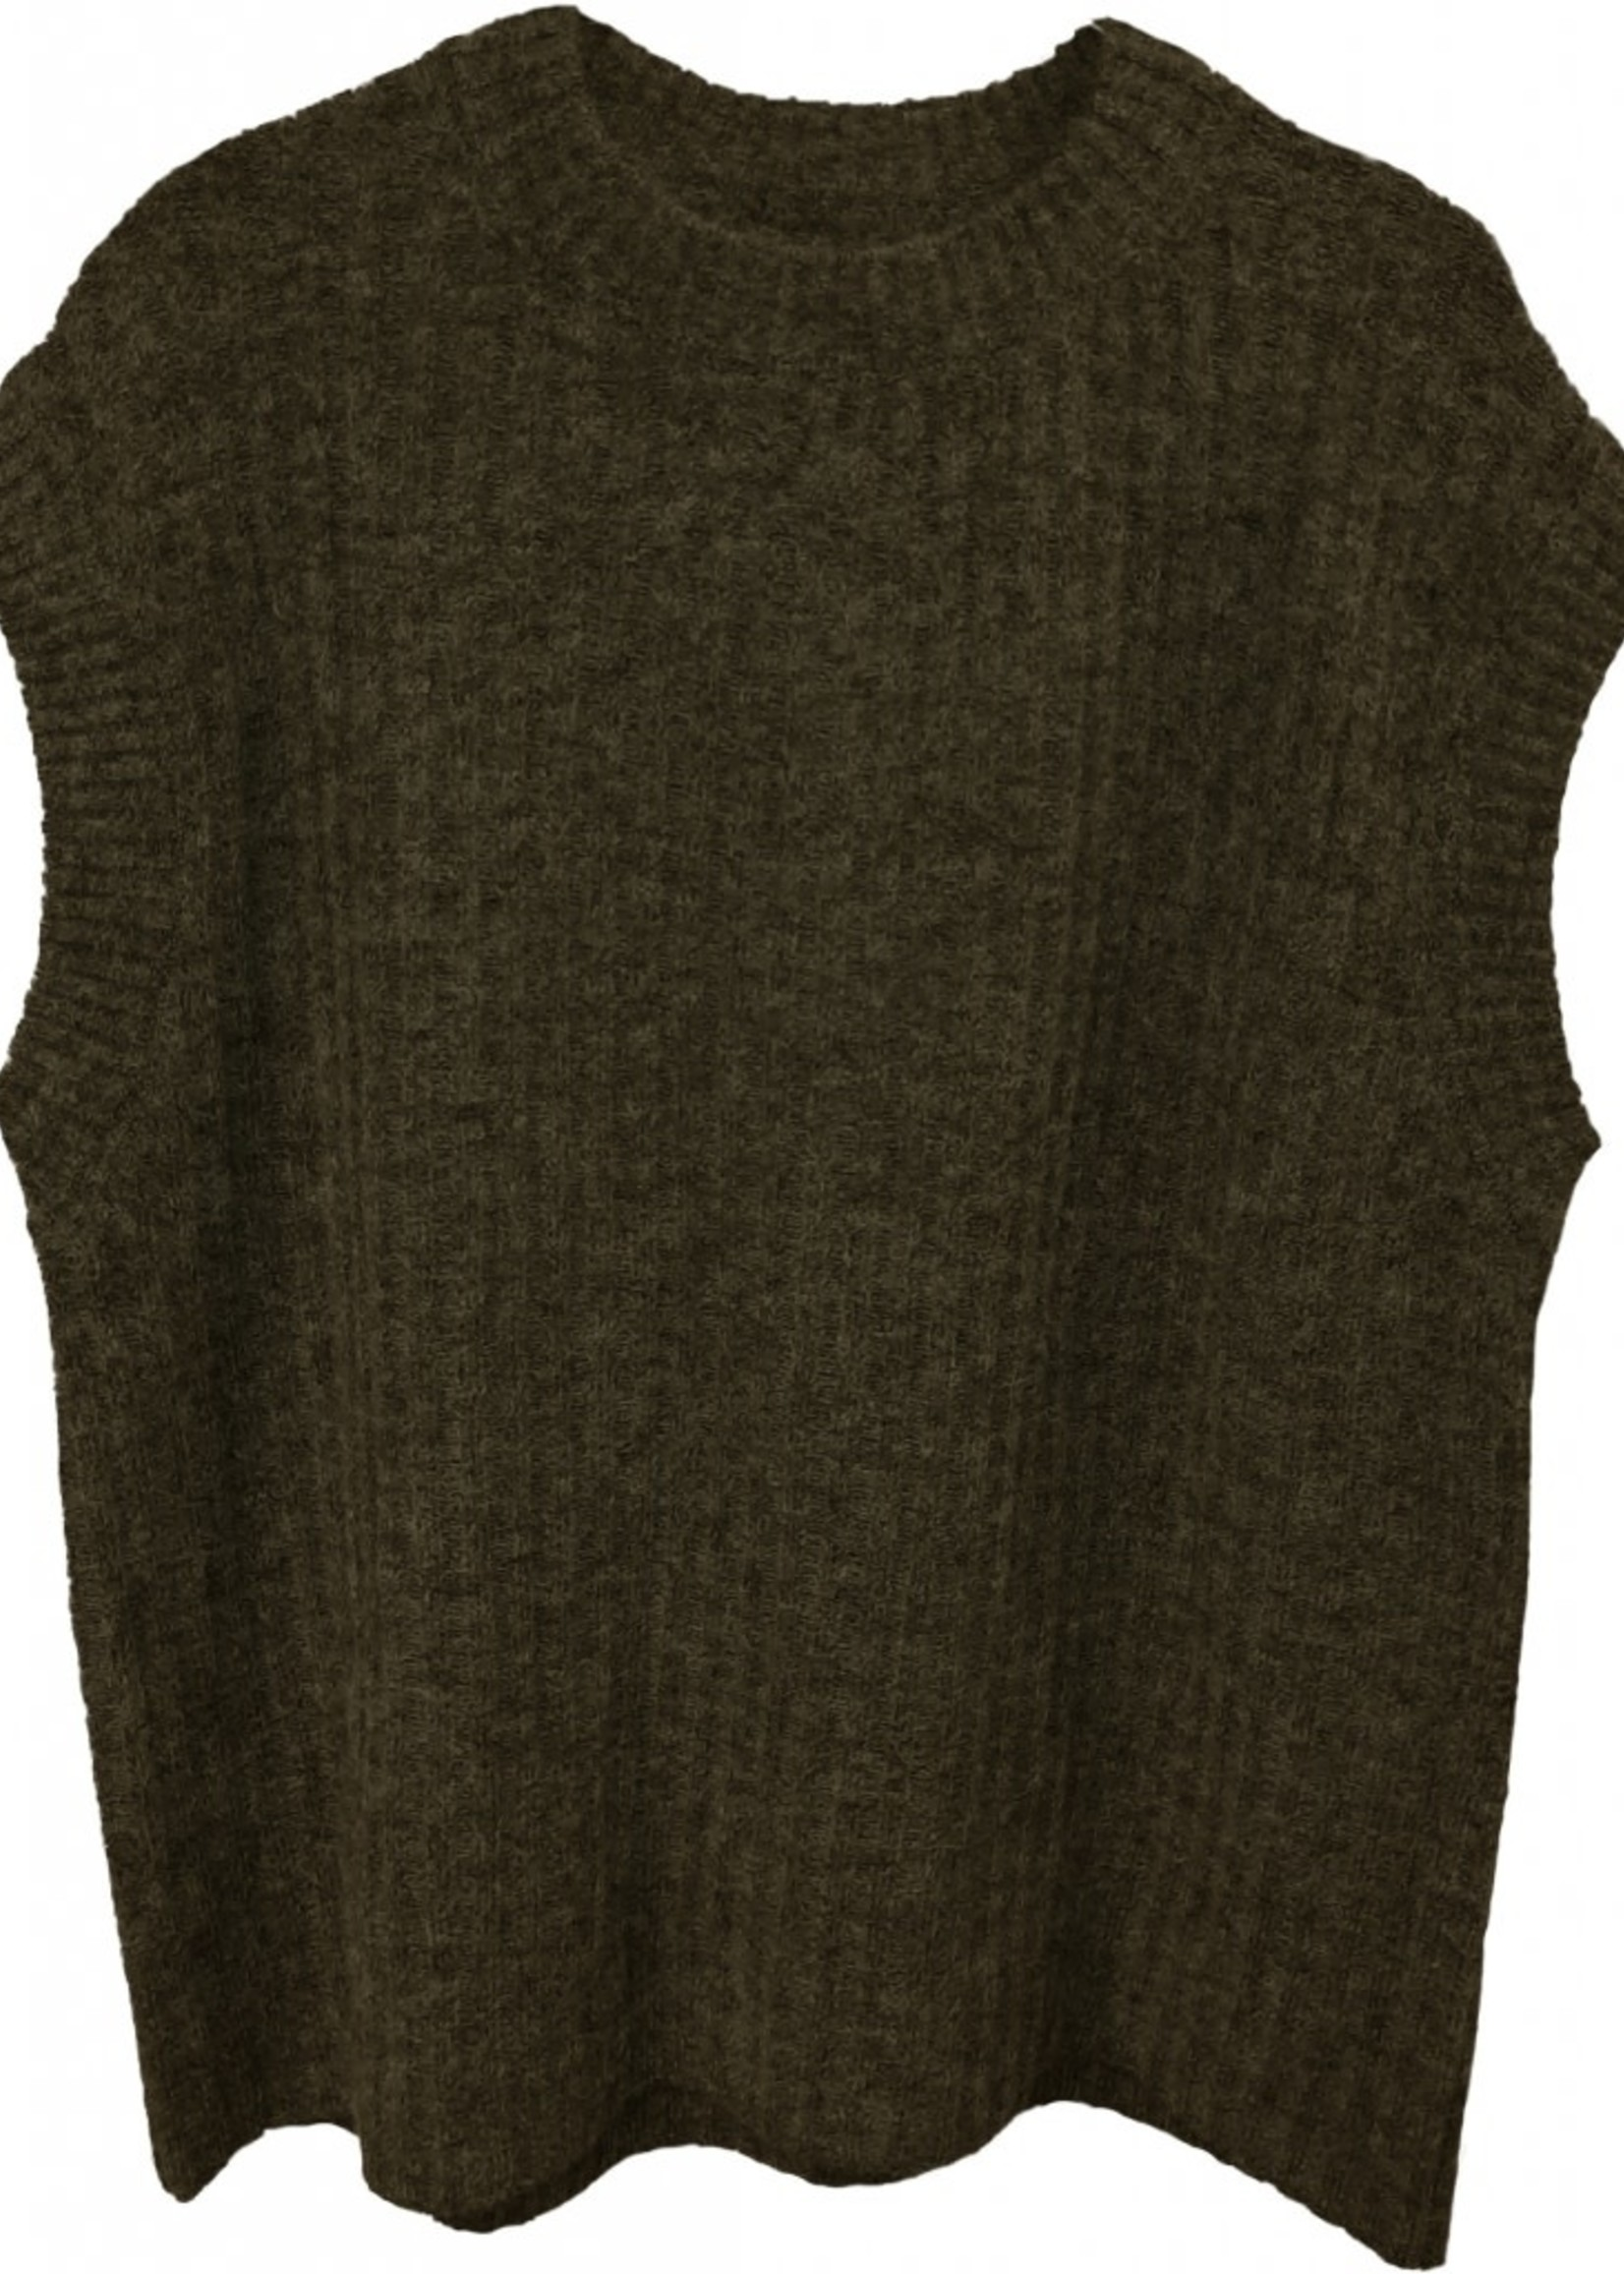 Norr O-neck knit waistcoat army